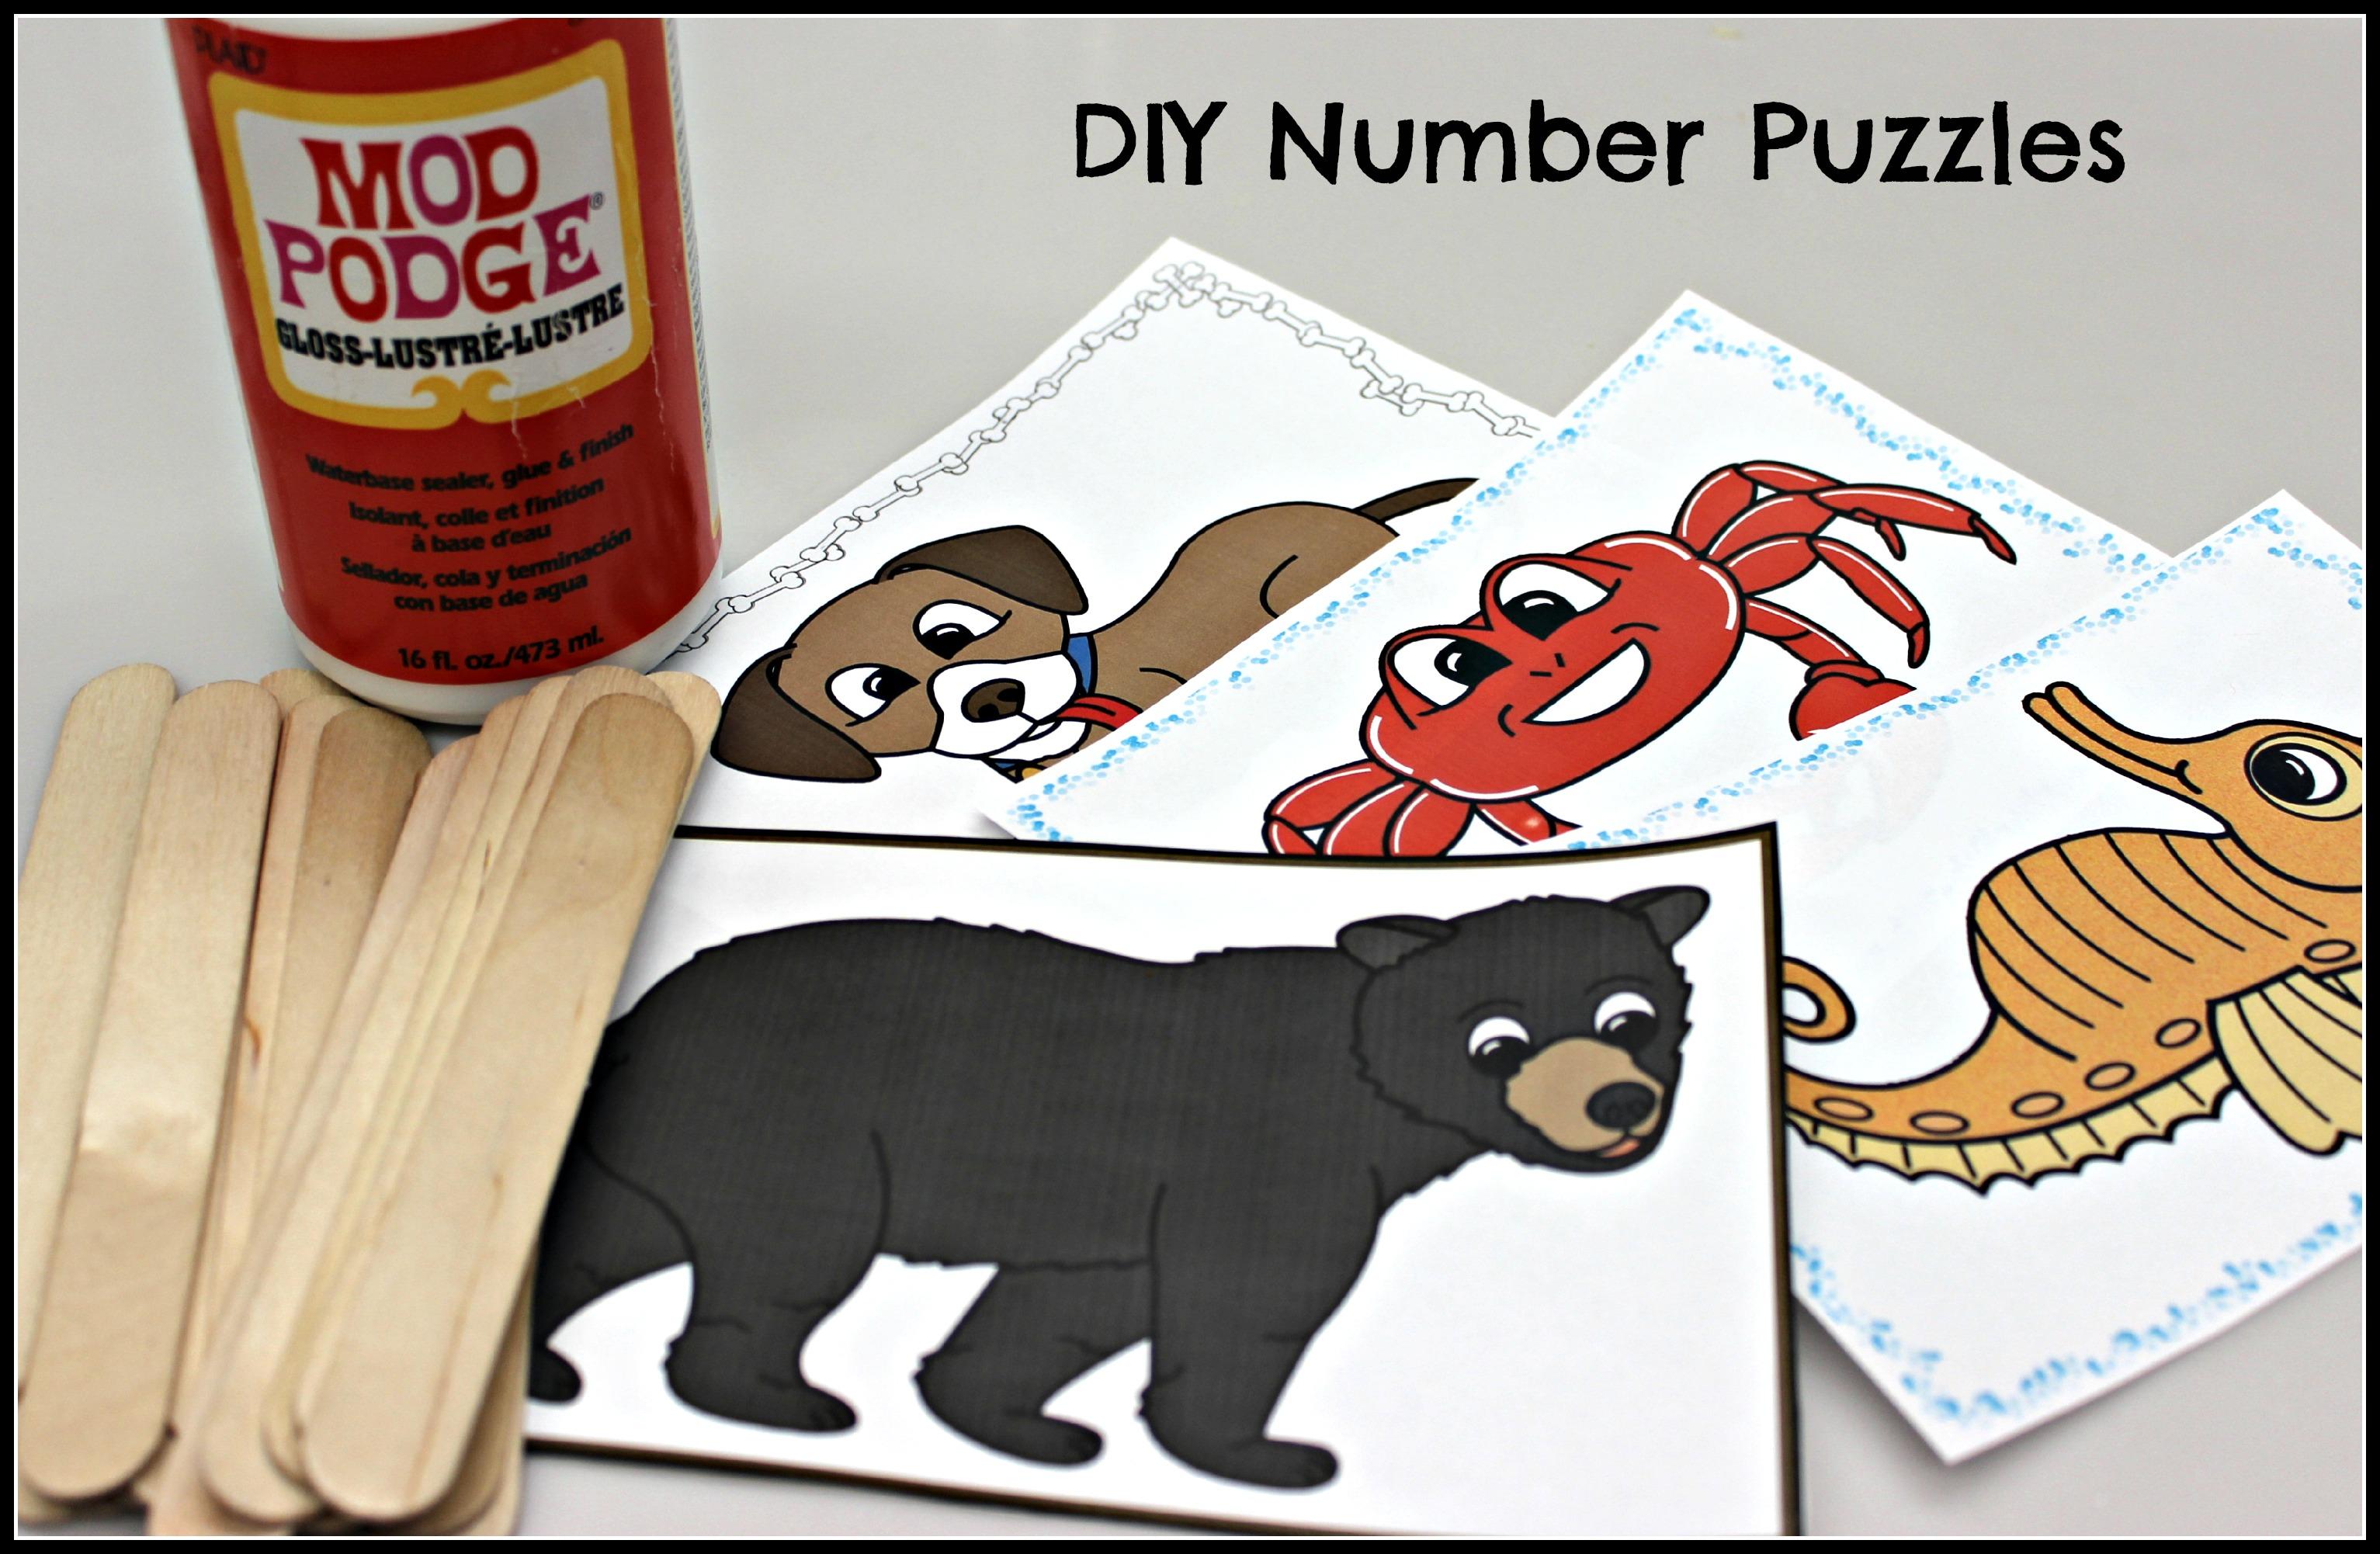 Diy Number Puzzles